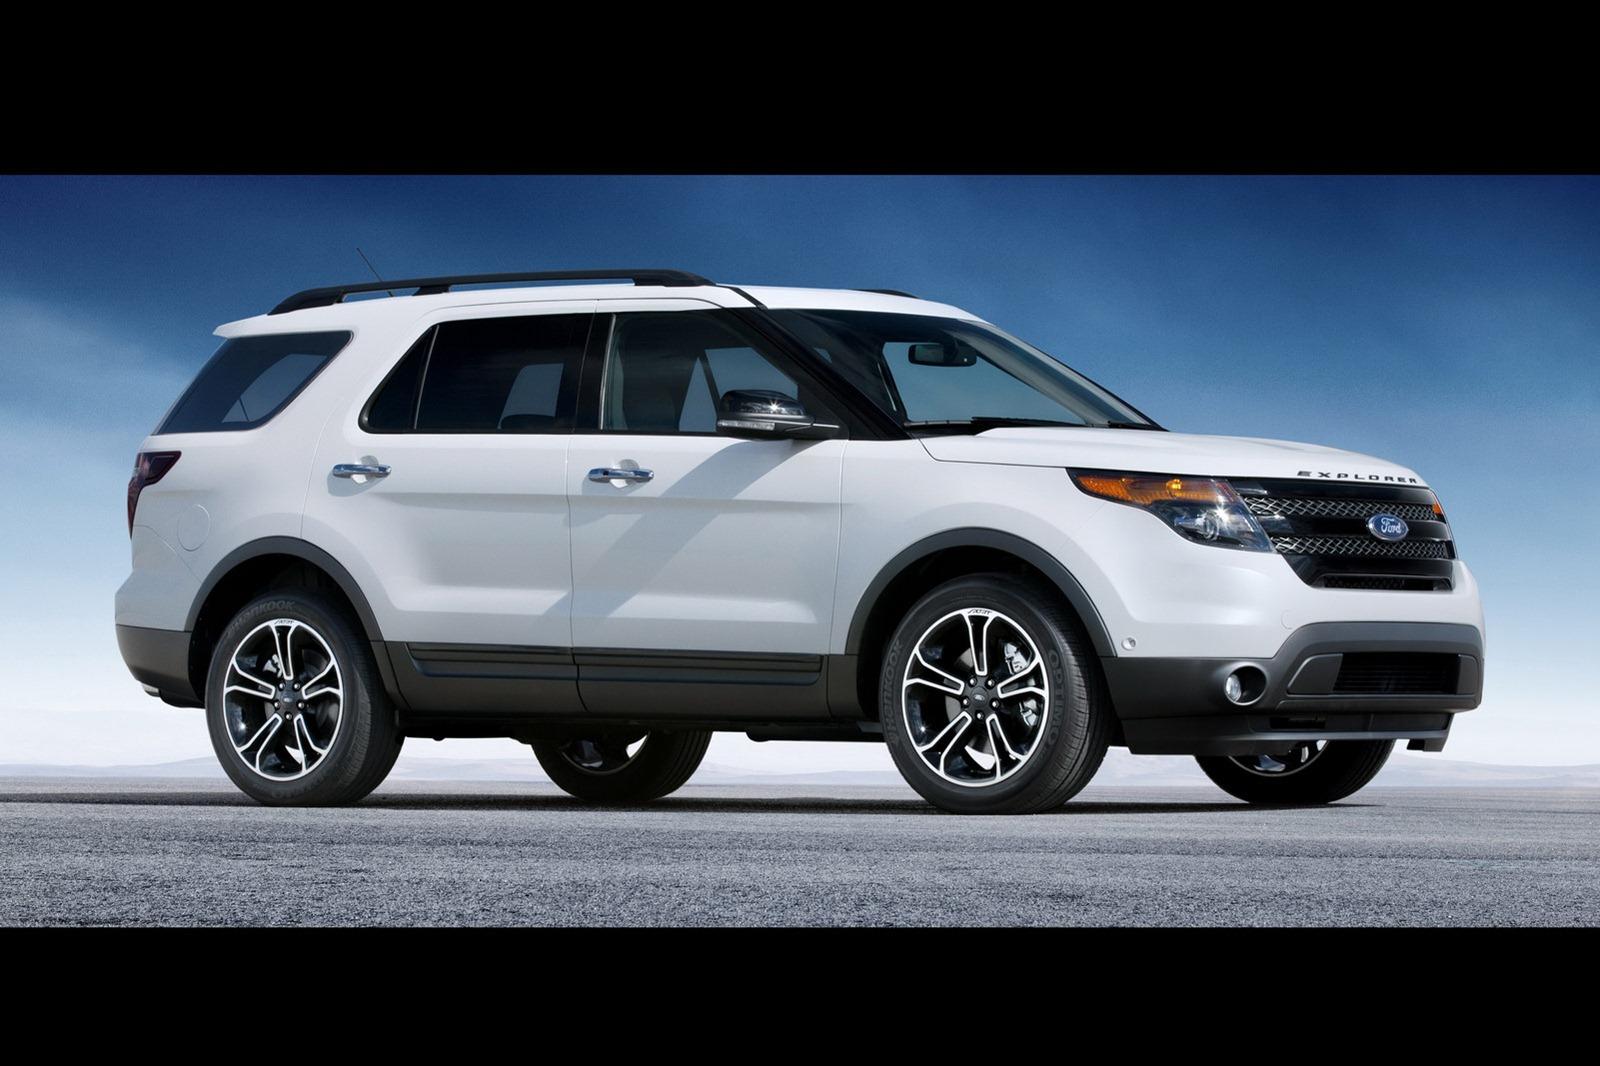 2013 Ford Explorer Sport Autoevolution